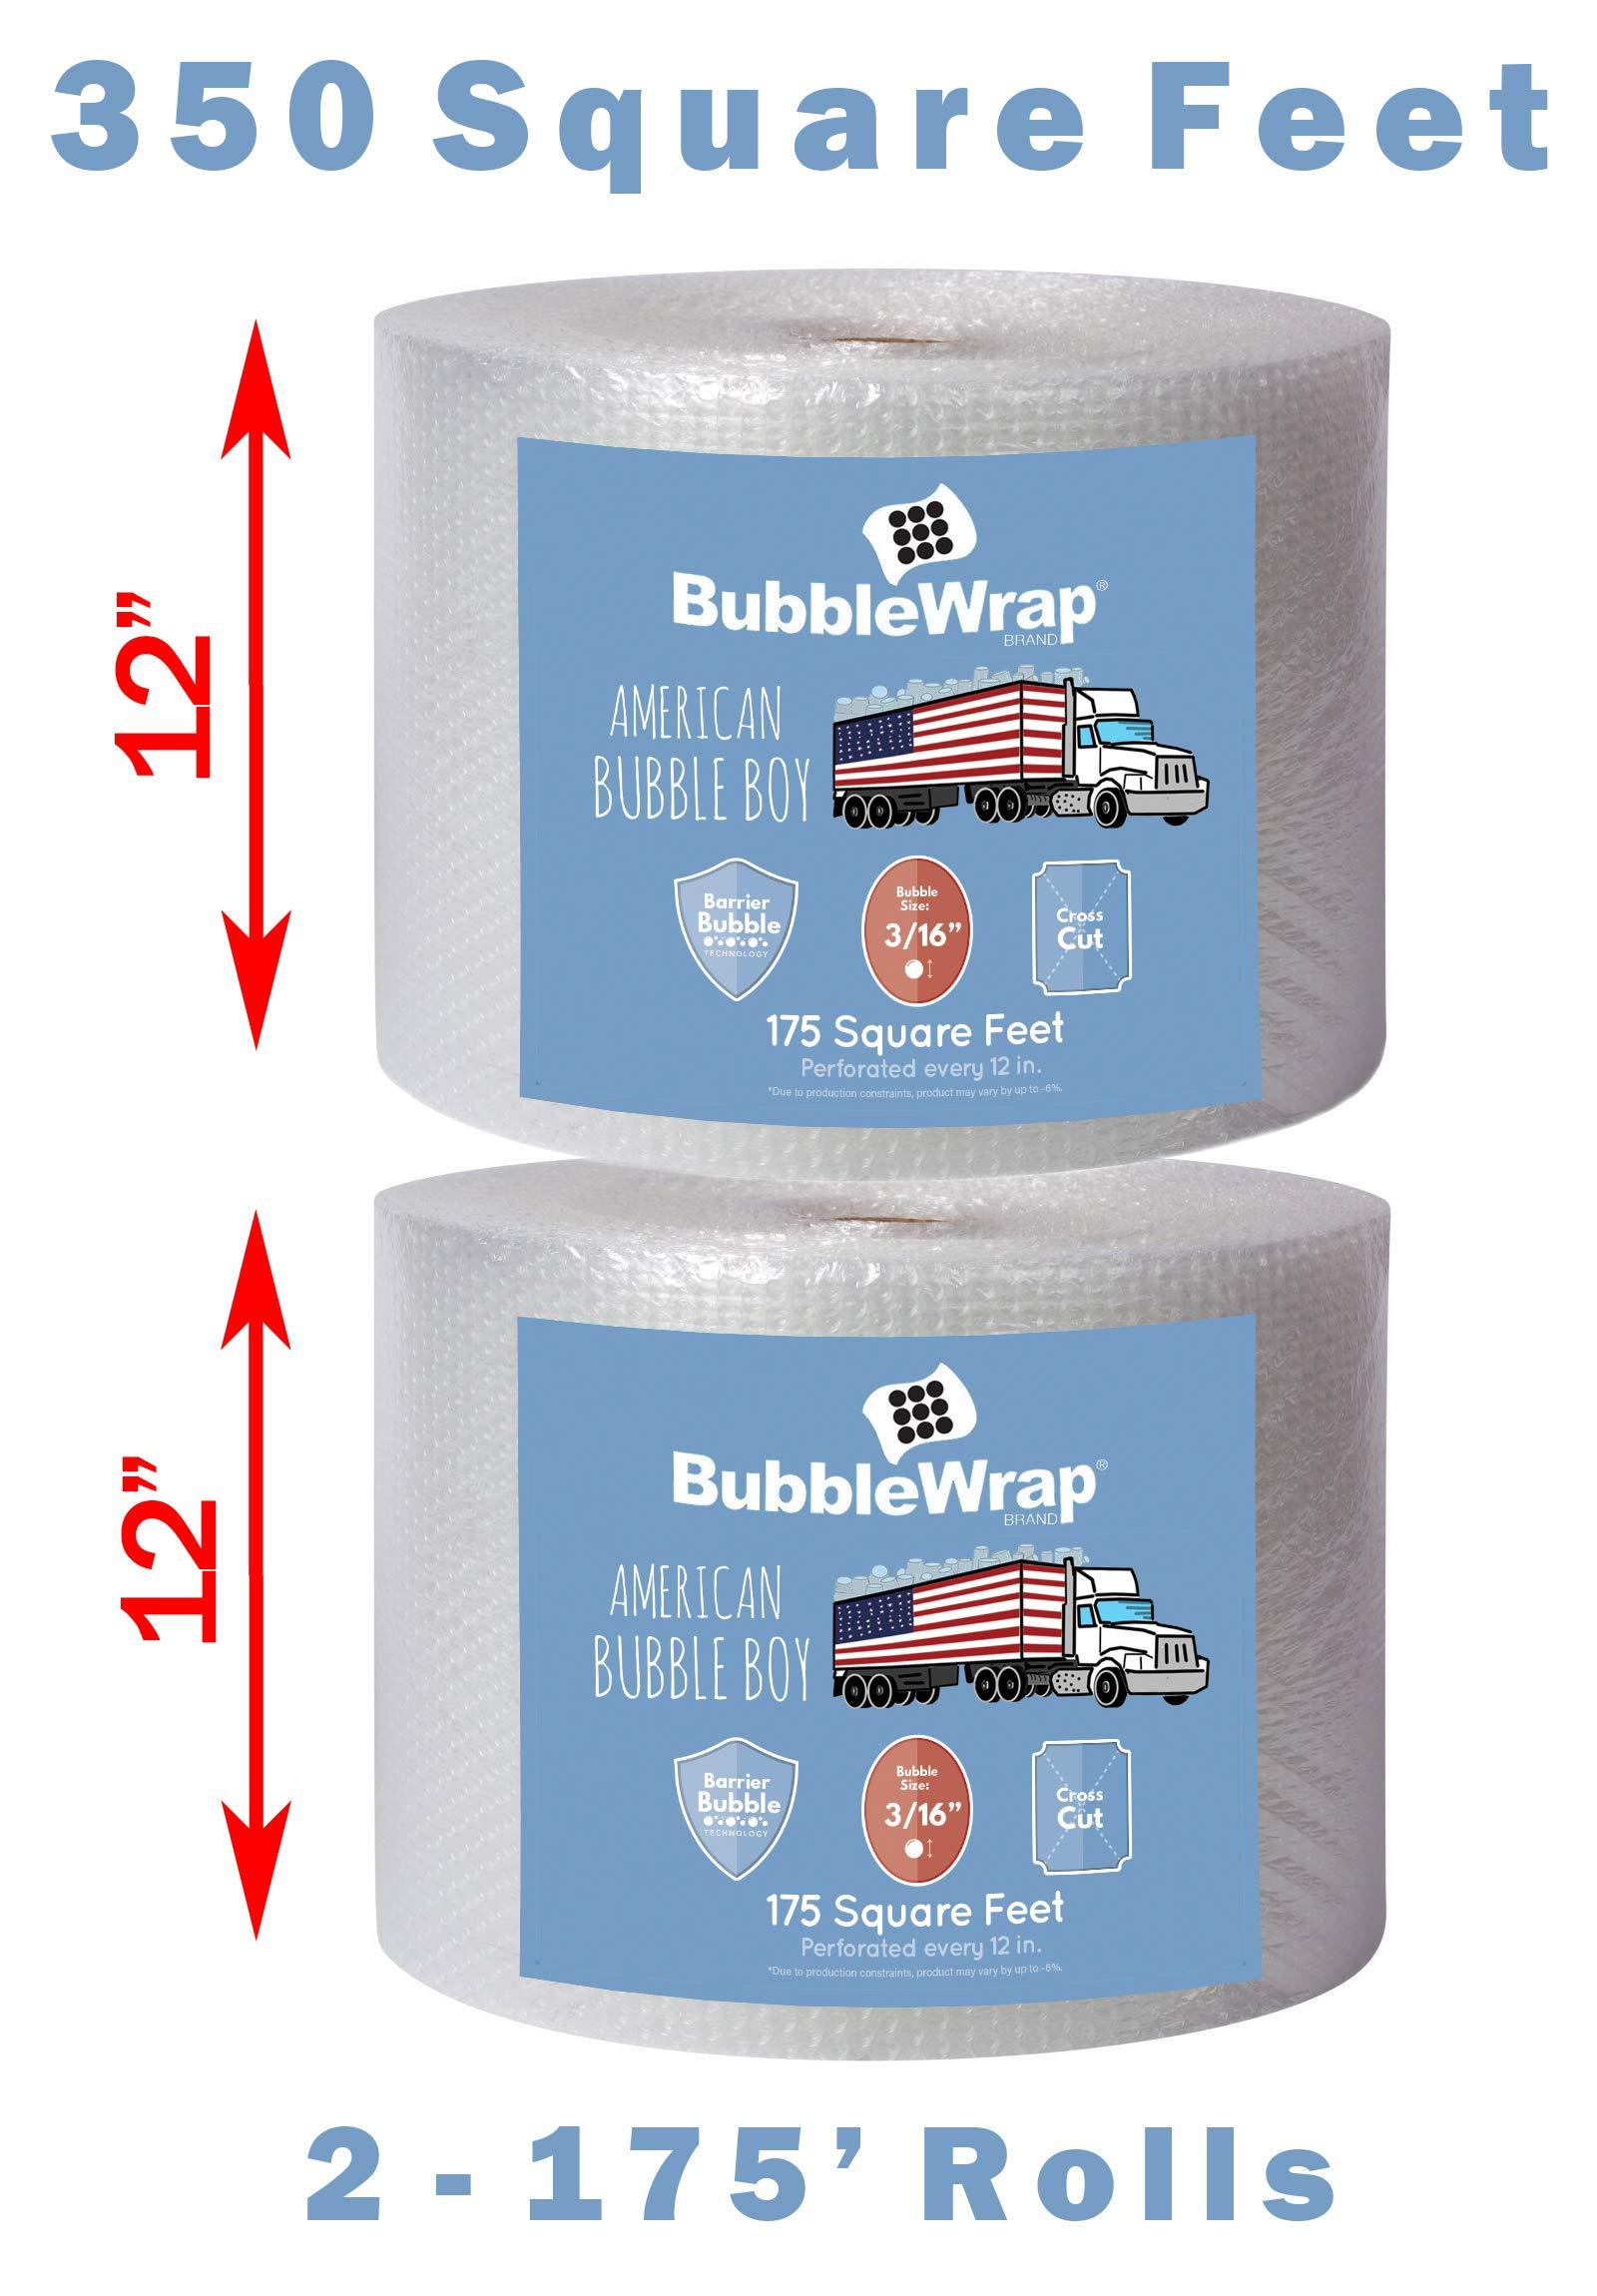 Bubble Wrap 350'BUBBLE BUNDLE for Packing, Shipping, Moving by American Bubble Boy by American Bubble boy